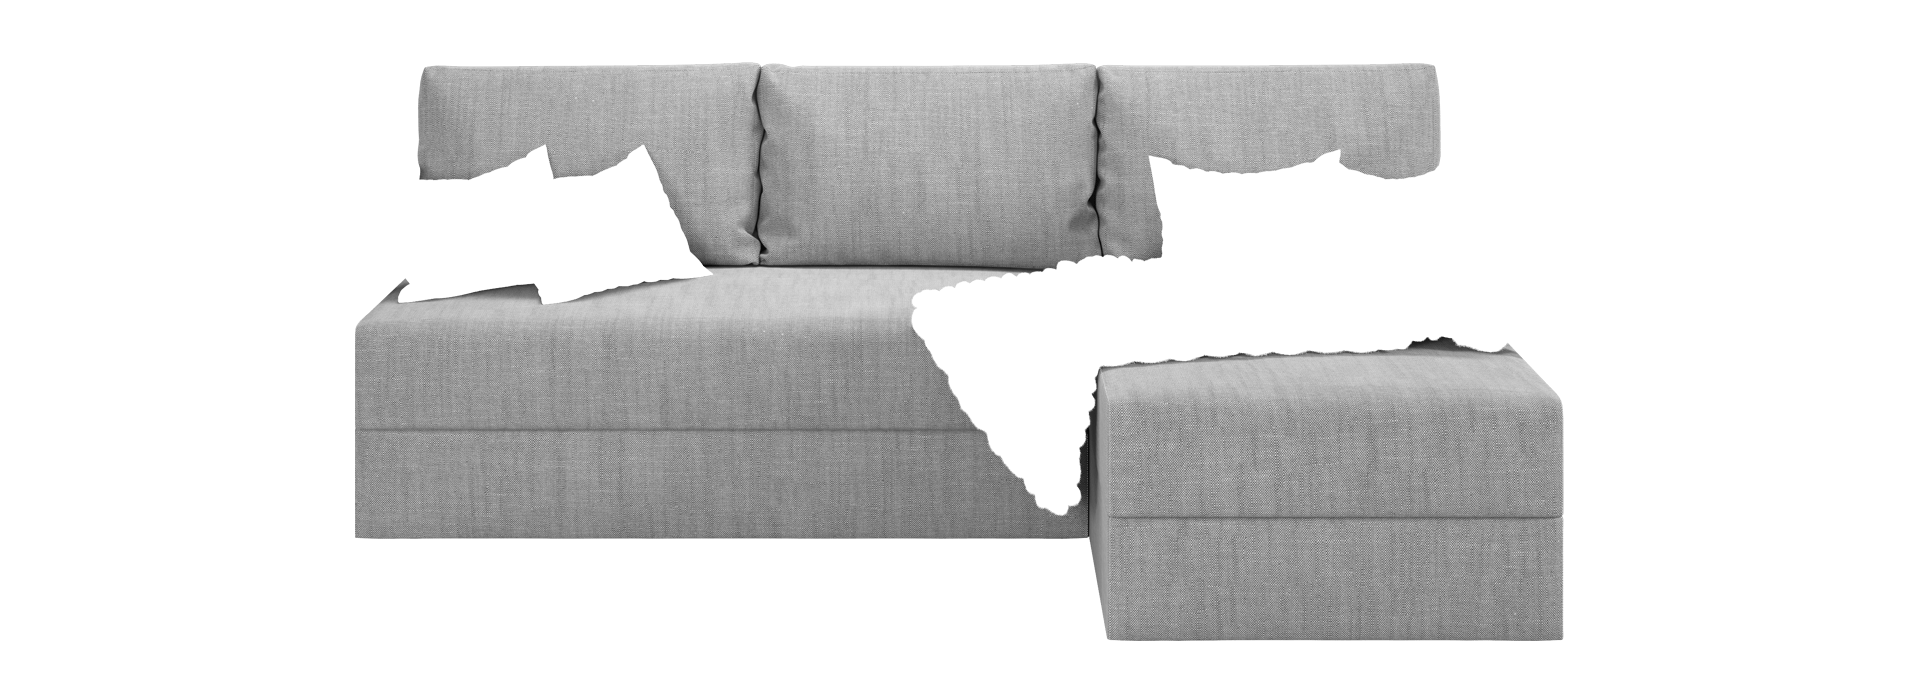 Тамми-4 угловой диван - маска 1